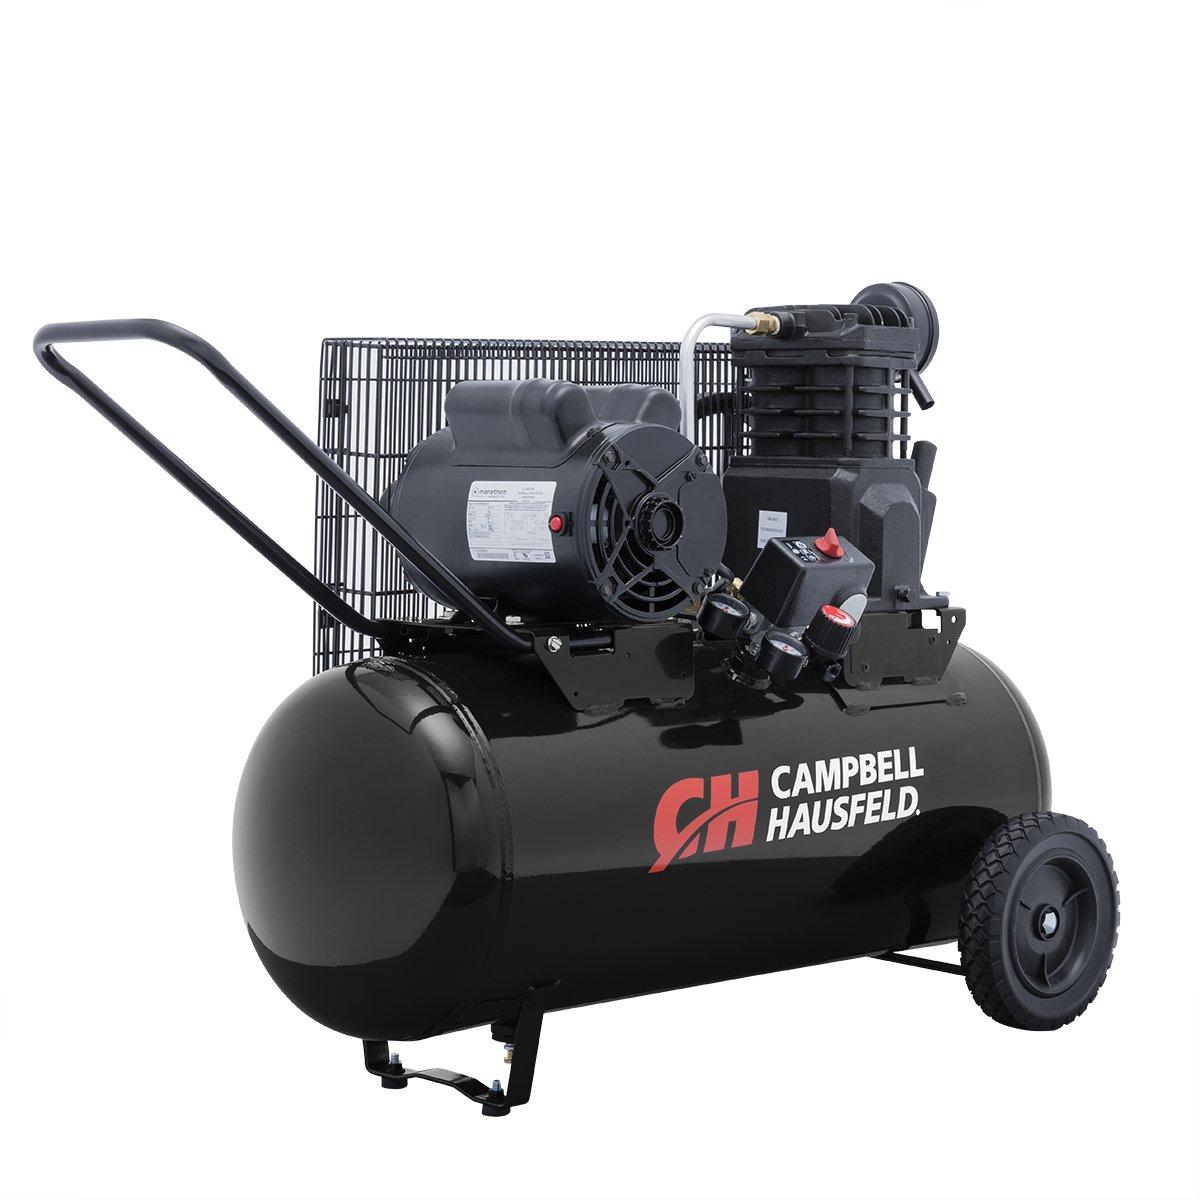 VX4002 Campbell Hausfeld 15 Gallon Portable Air Compressor